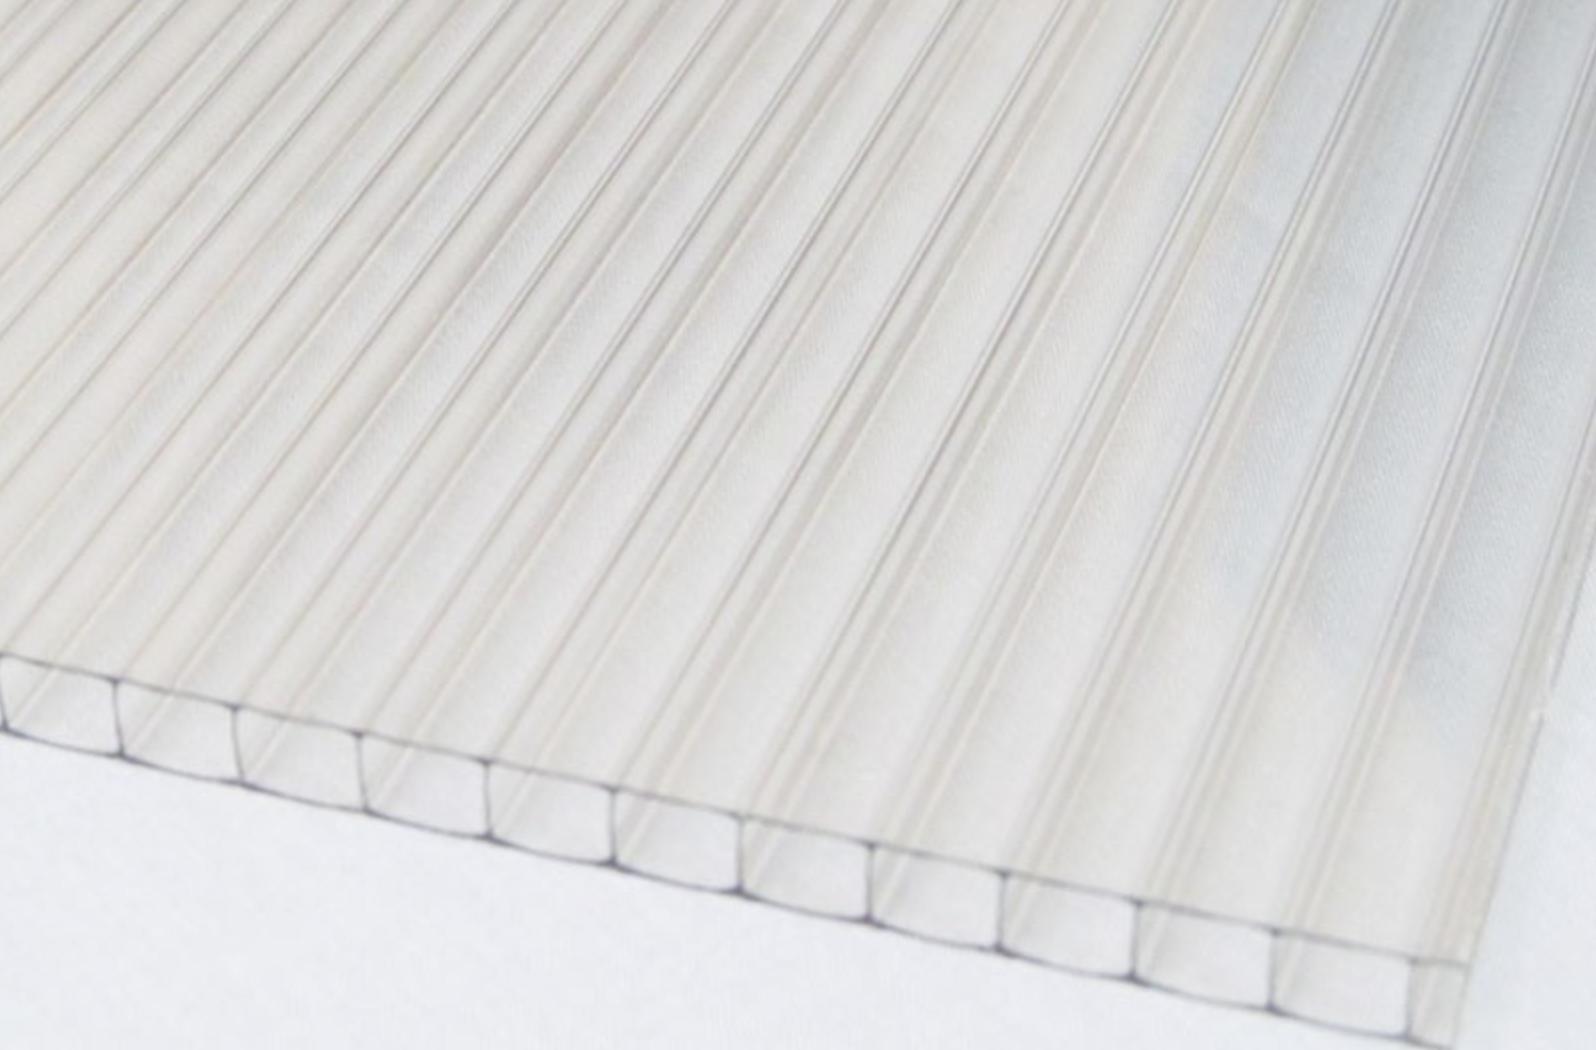 LEXAN THERMOCLEAR sheet